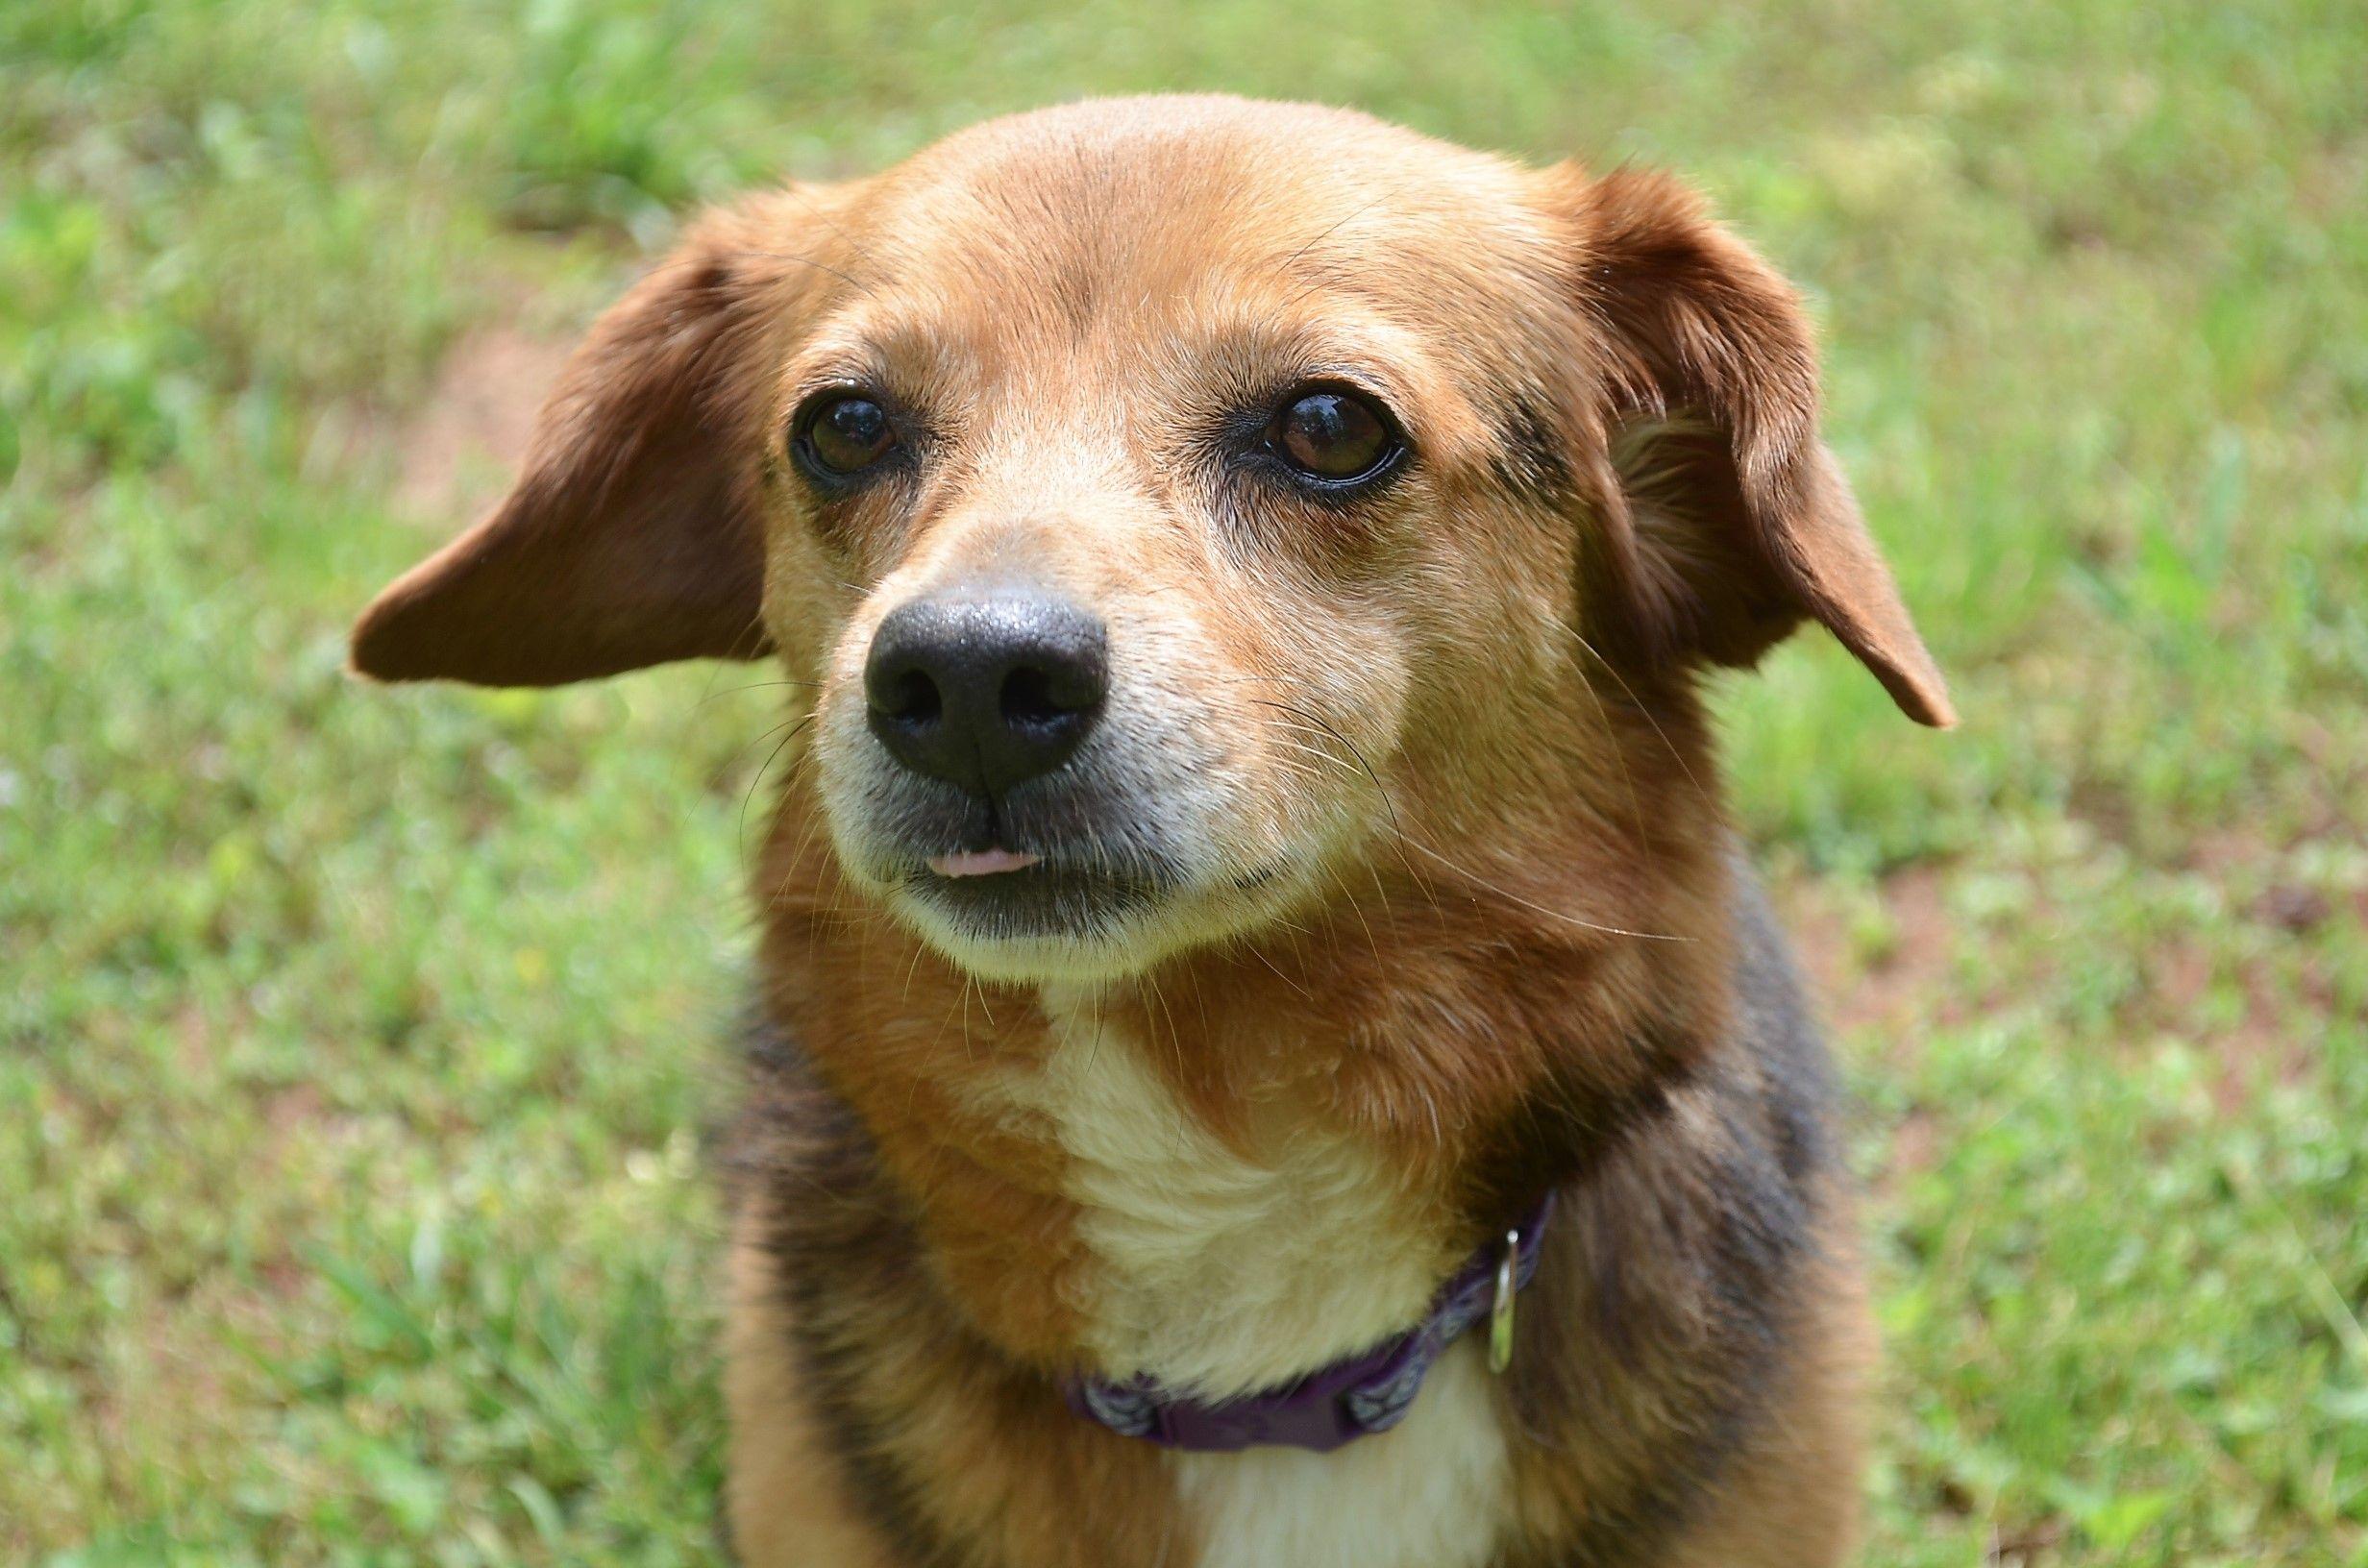 Doxle dog for Adoption in Atlanta, GA. ADN536692 on